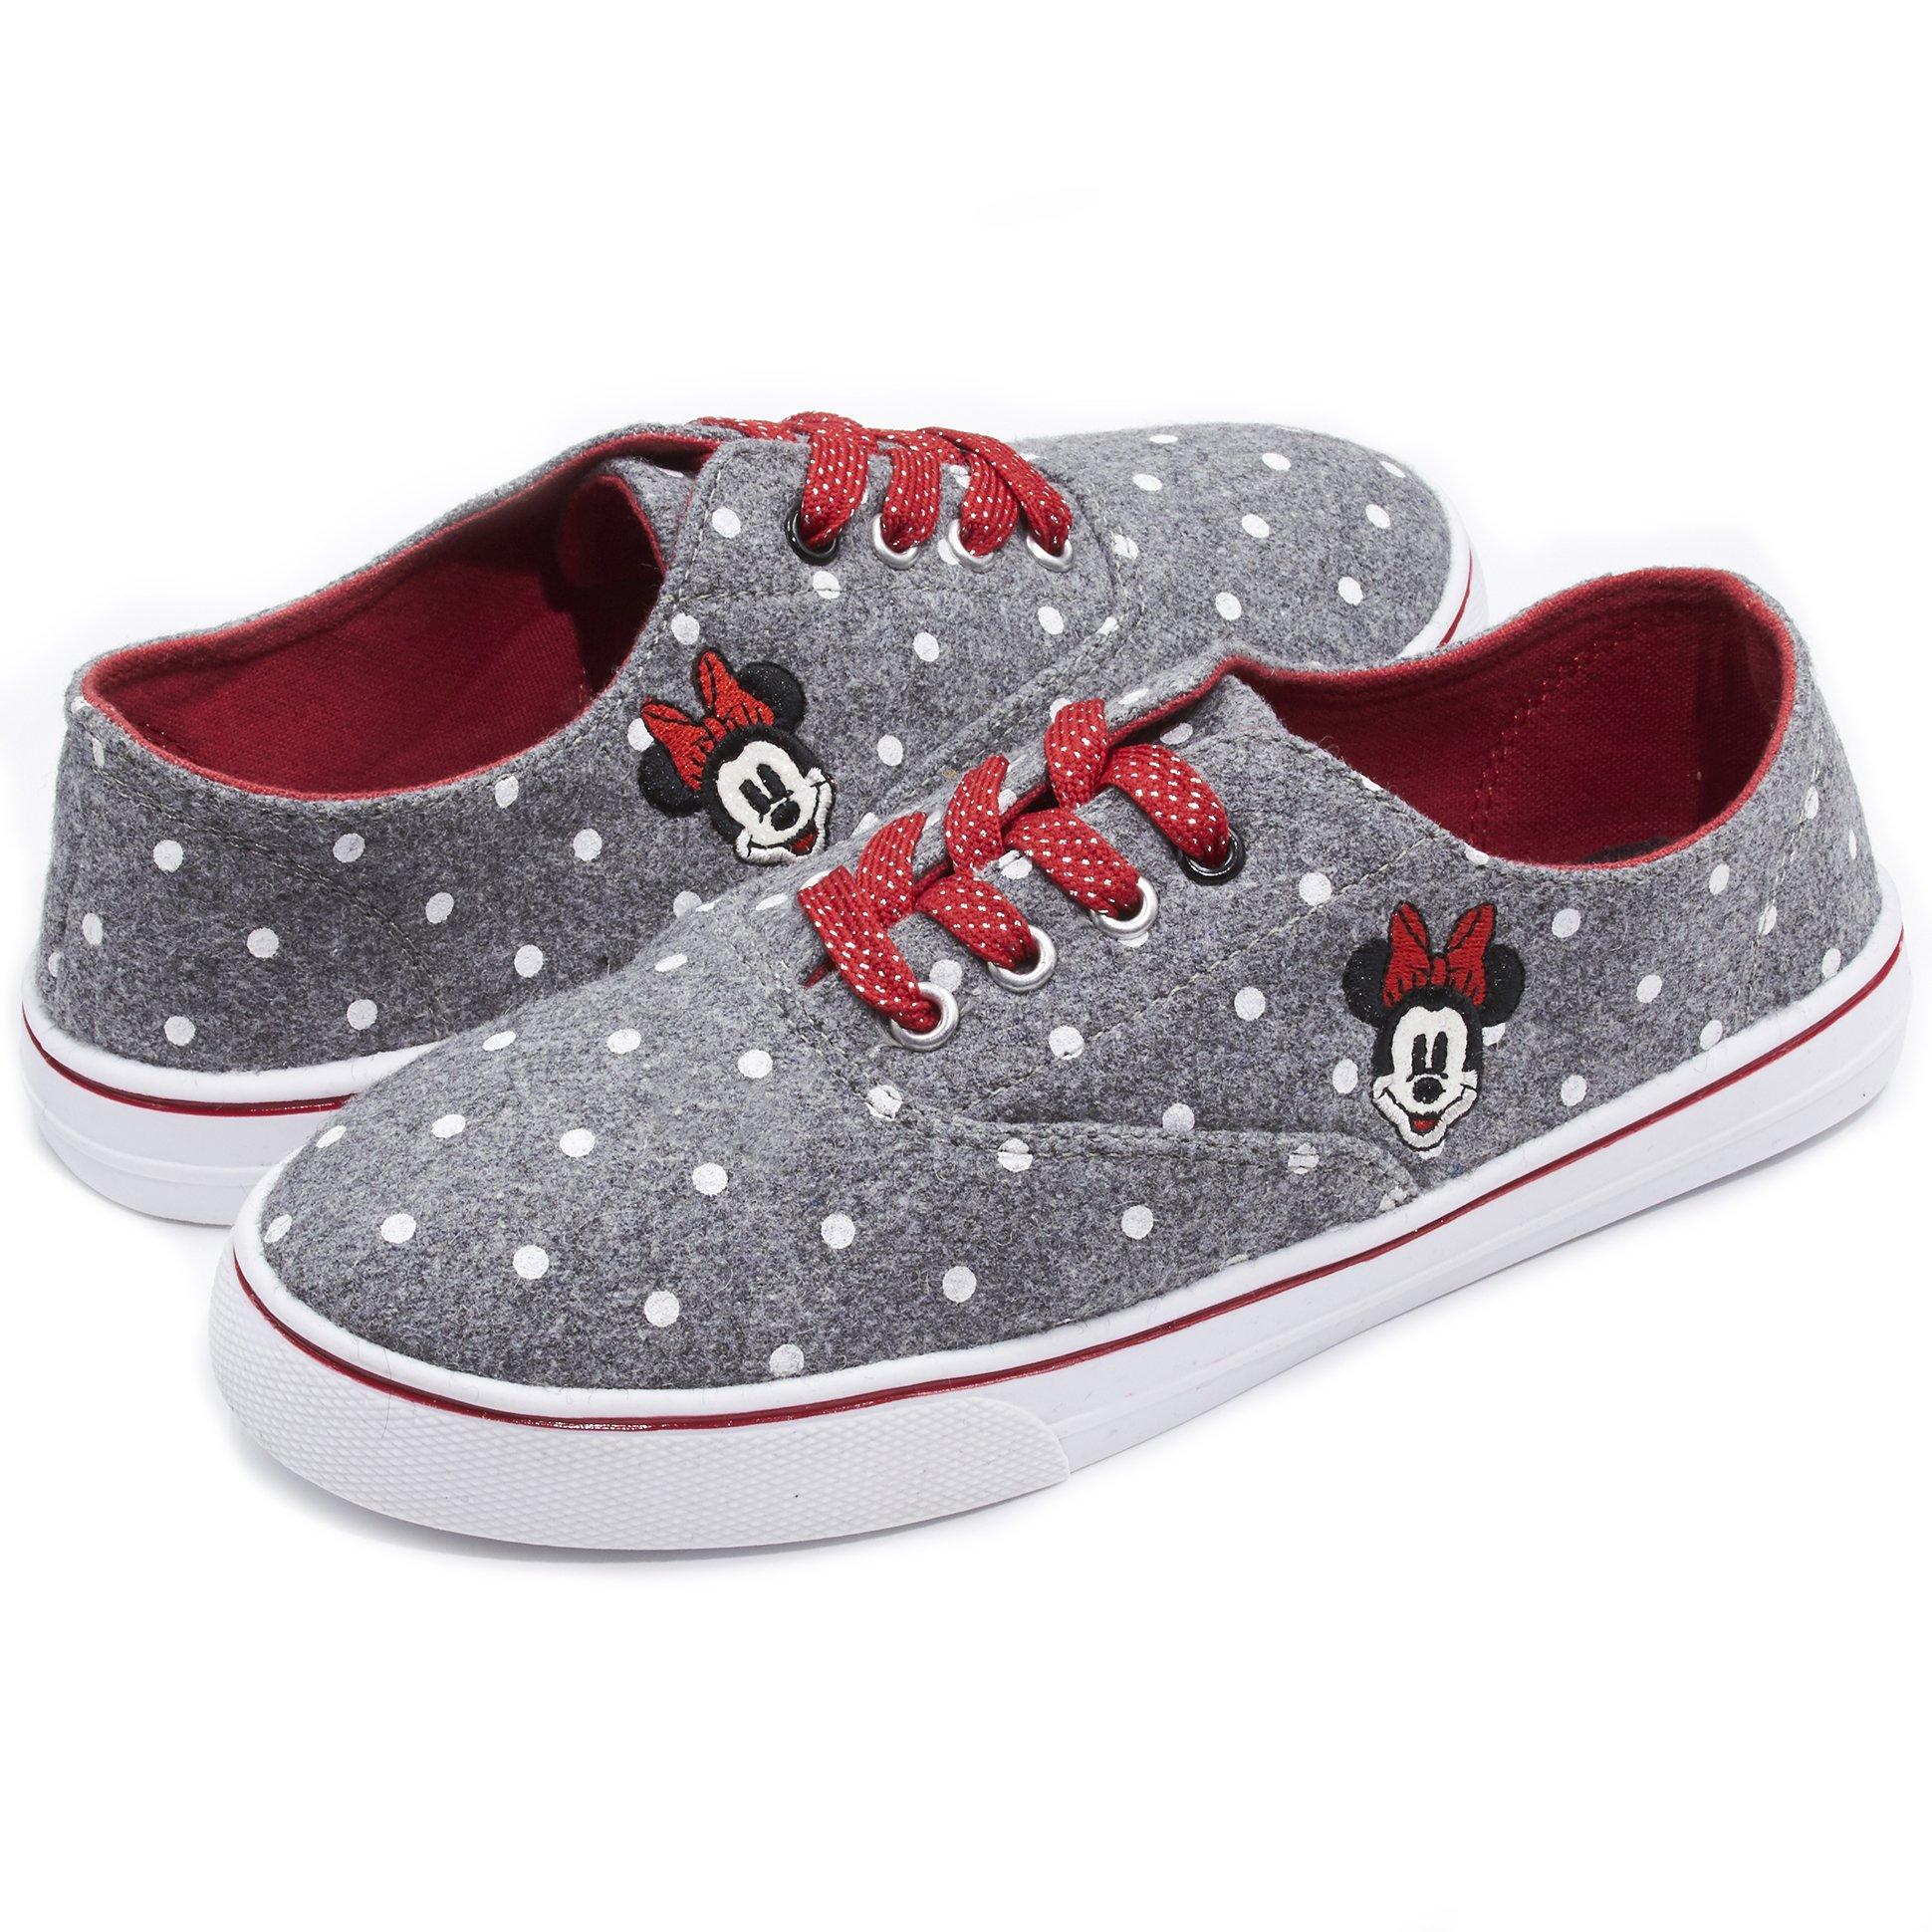 Disney Minnie Mouse Polka DOT Peekaboo Fashion Lace up Sneaker Grey 10